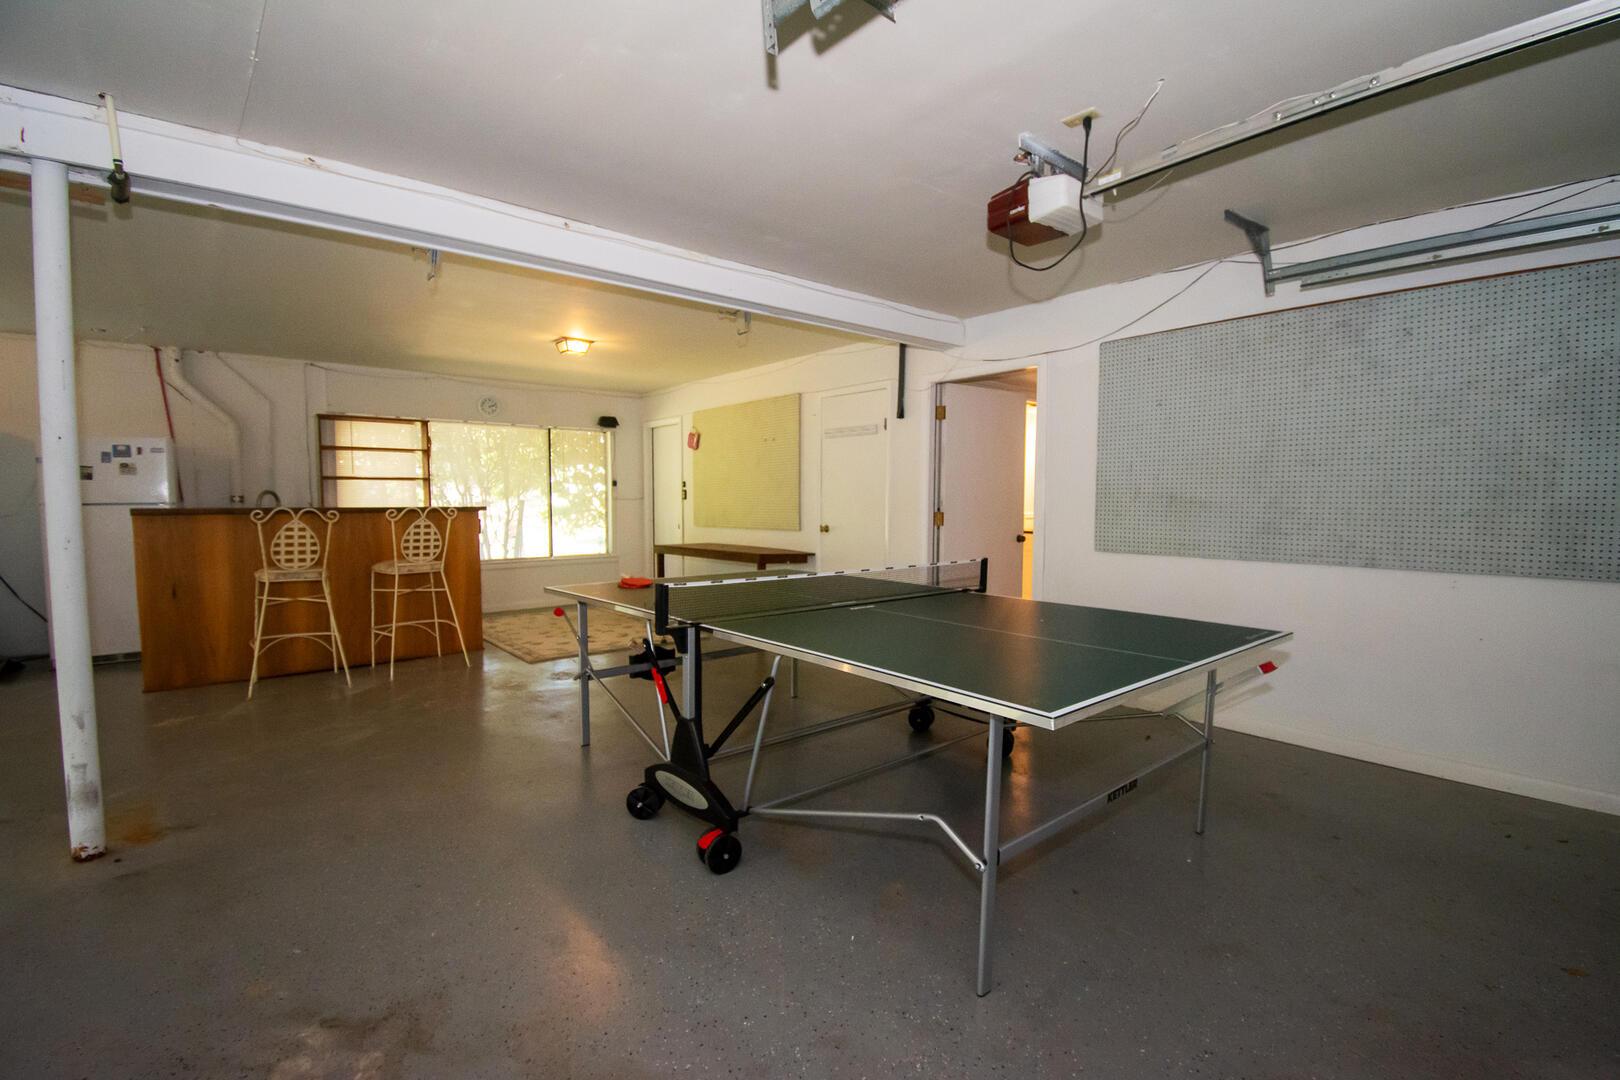 Garage Ping Pong Table